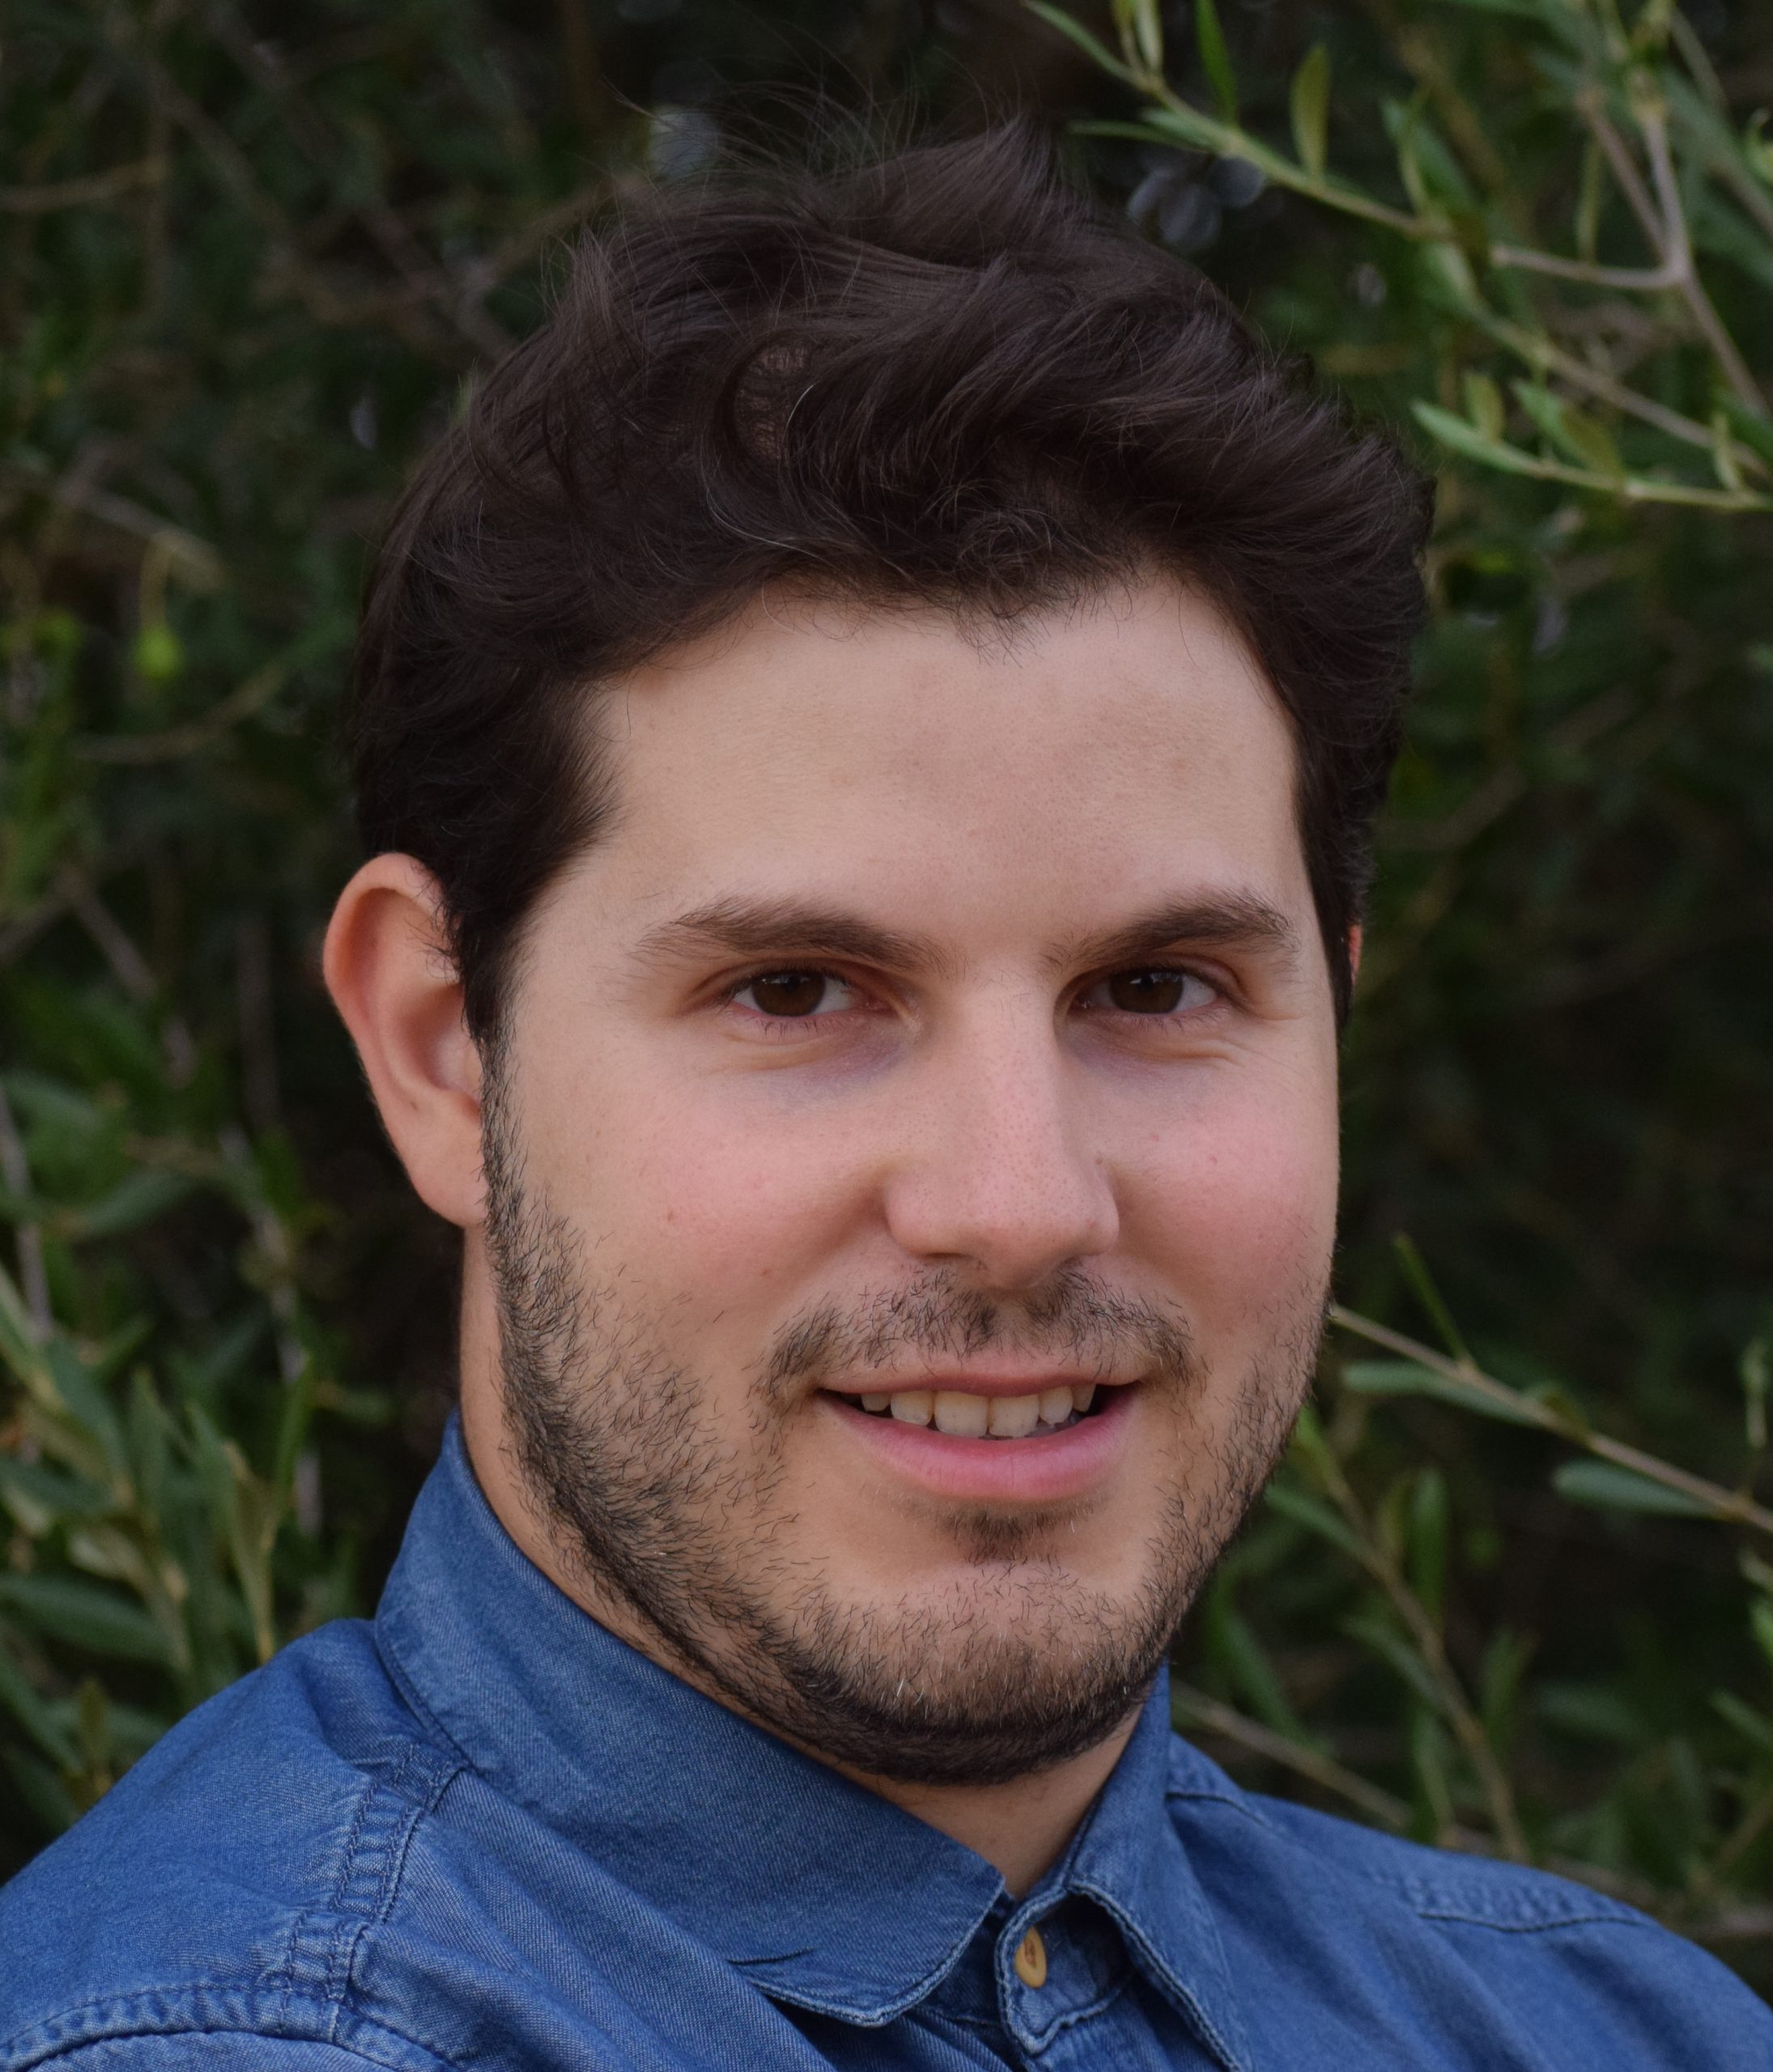 Giacomo Loi Wins Fellowship at the Fondation pour la Mémoire de la Shoah